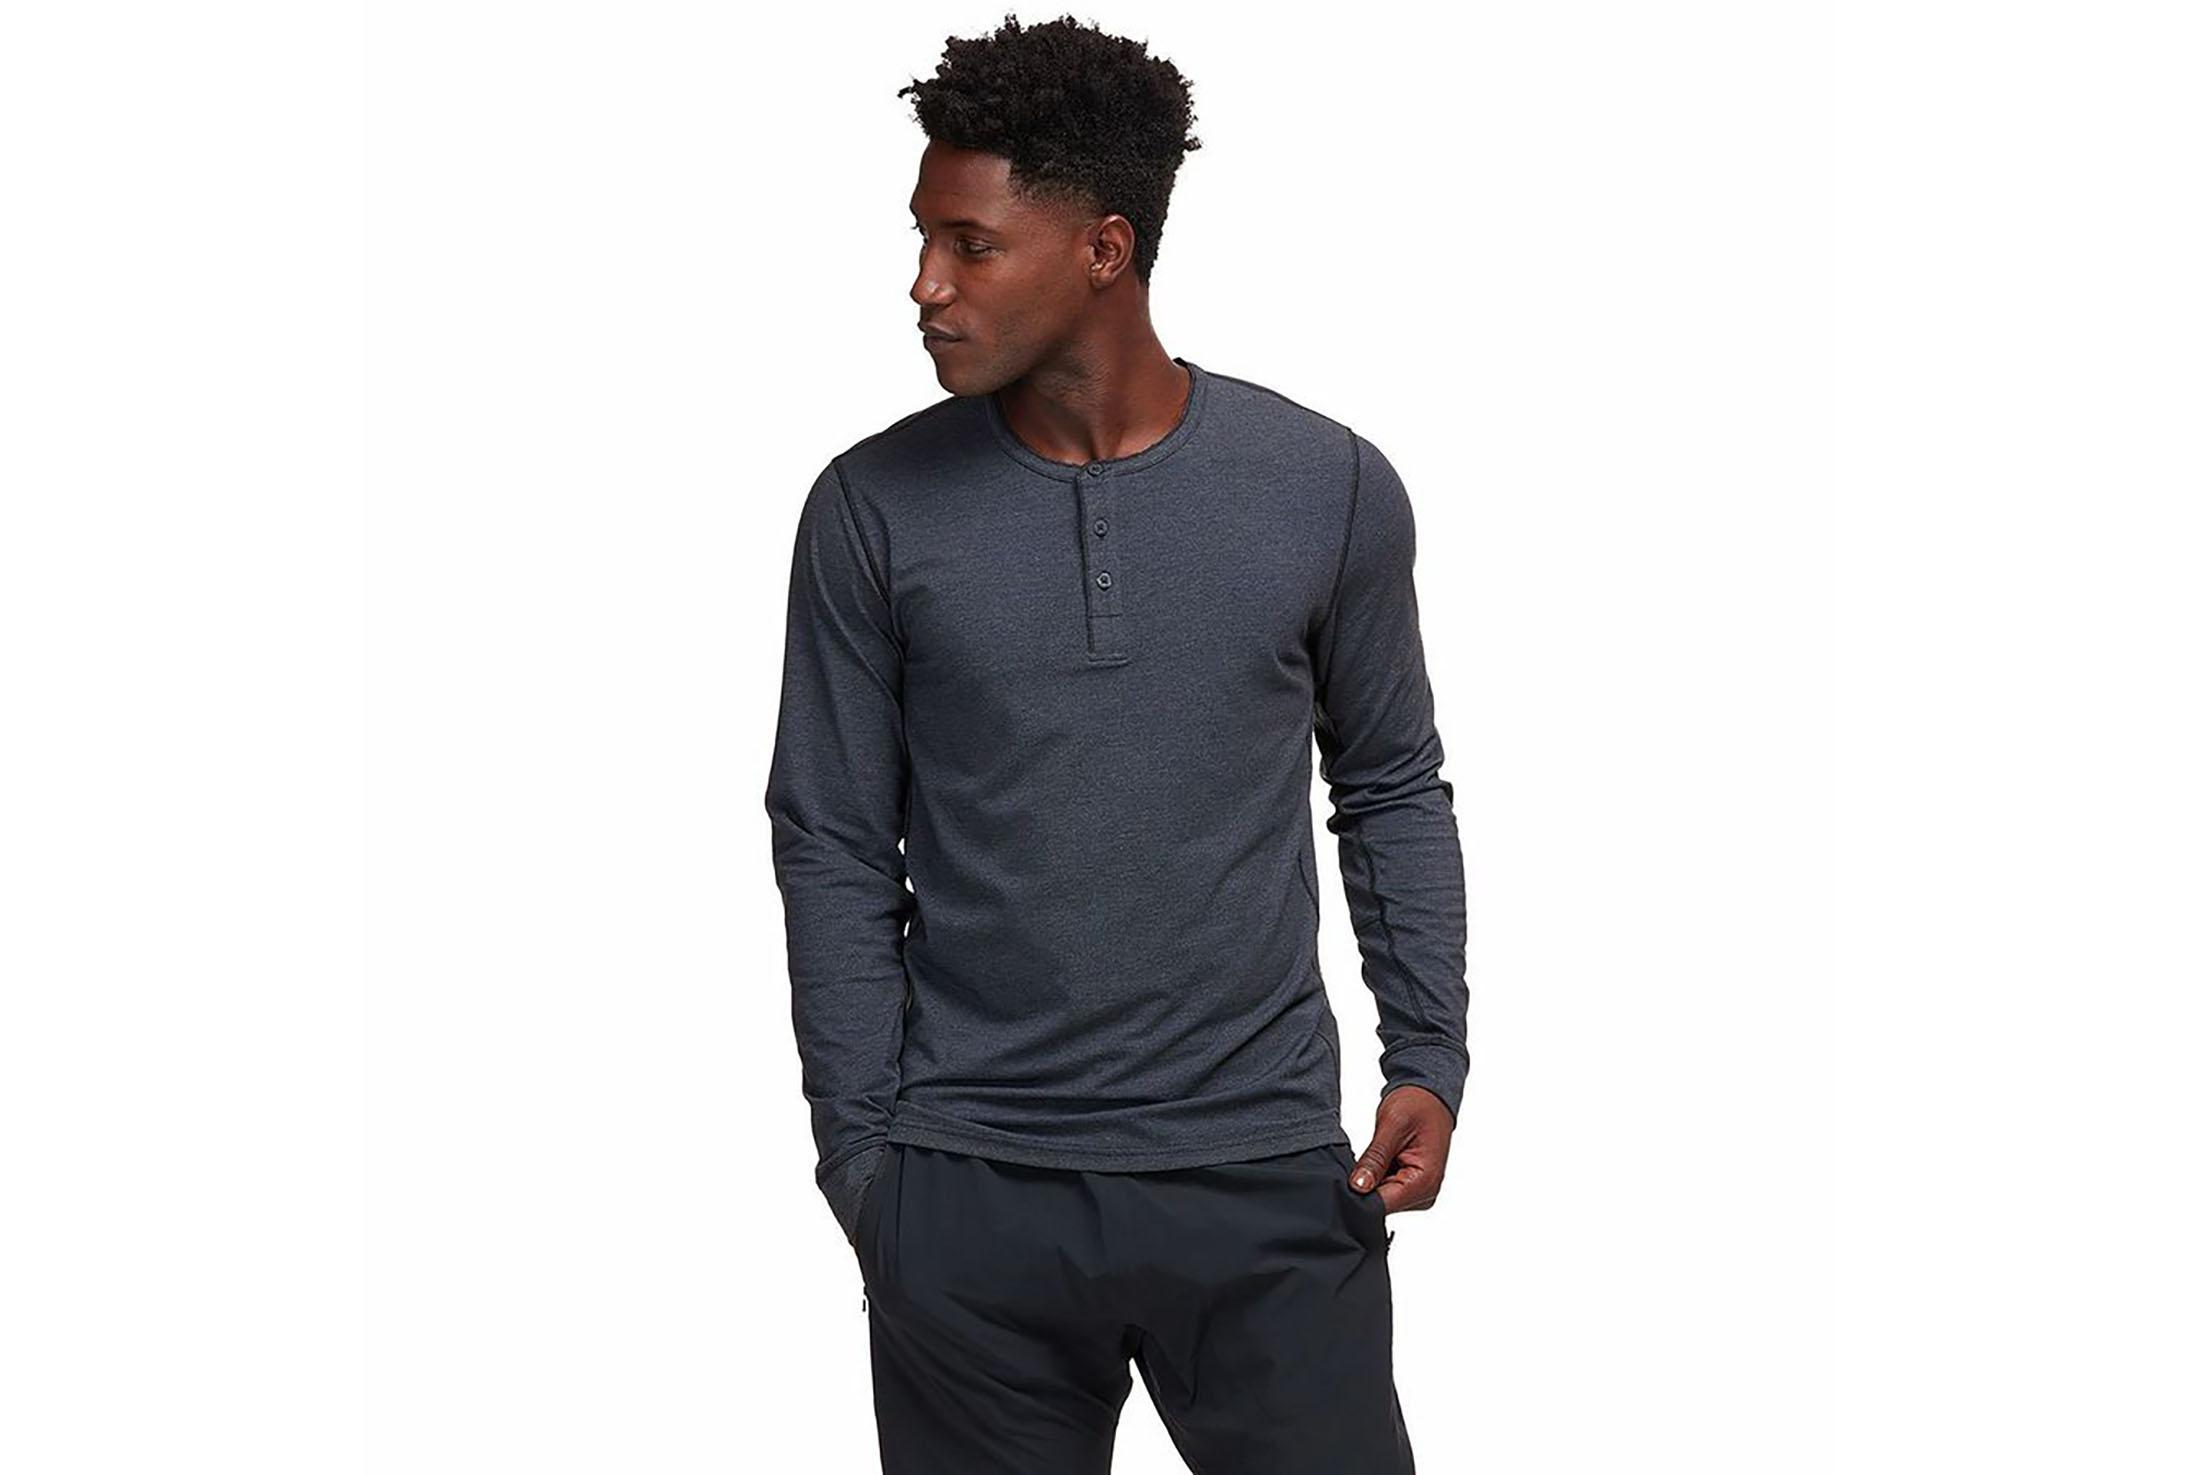 man wearing black henley shirt